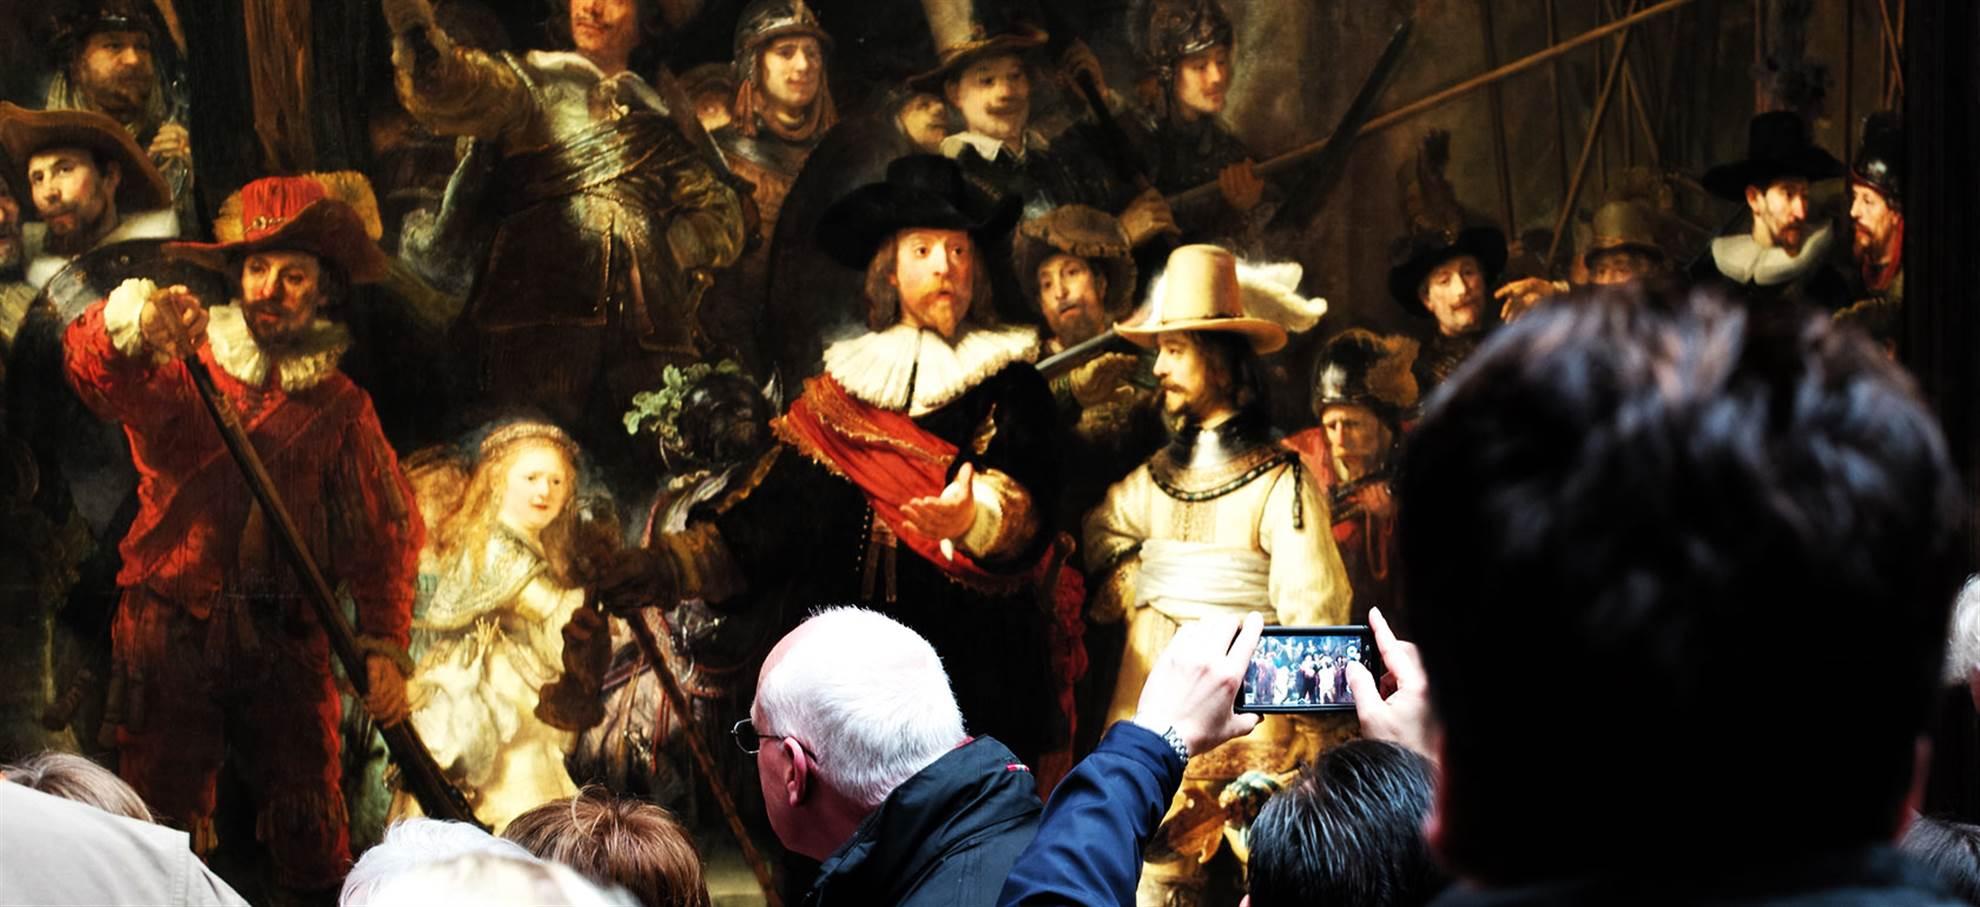 Highlights Rijksmuseum - Van Gogh Museum